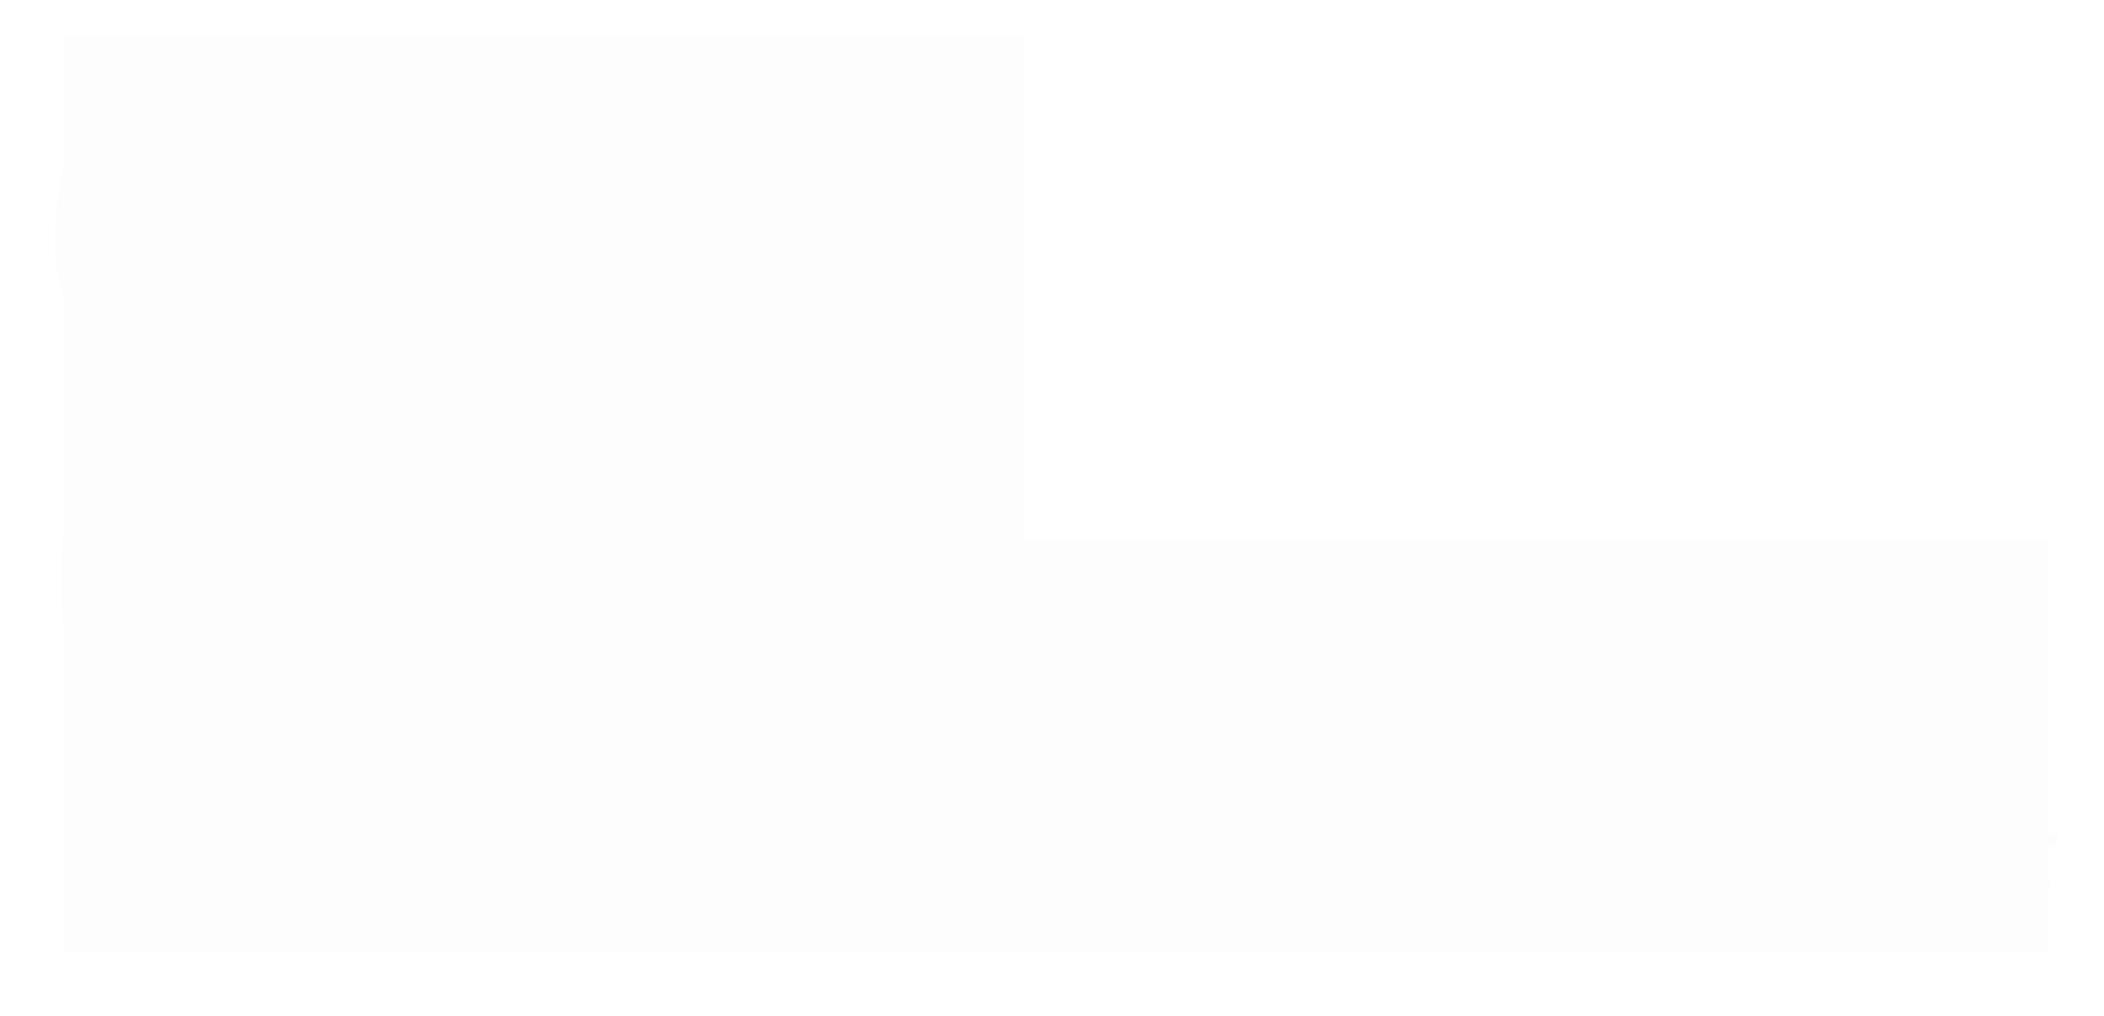 New1F2FLogo-White.png